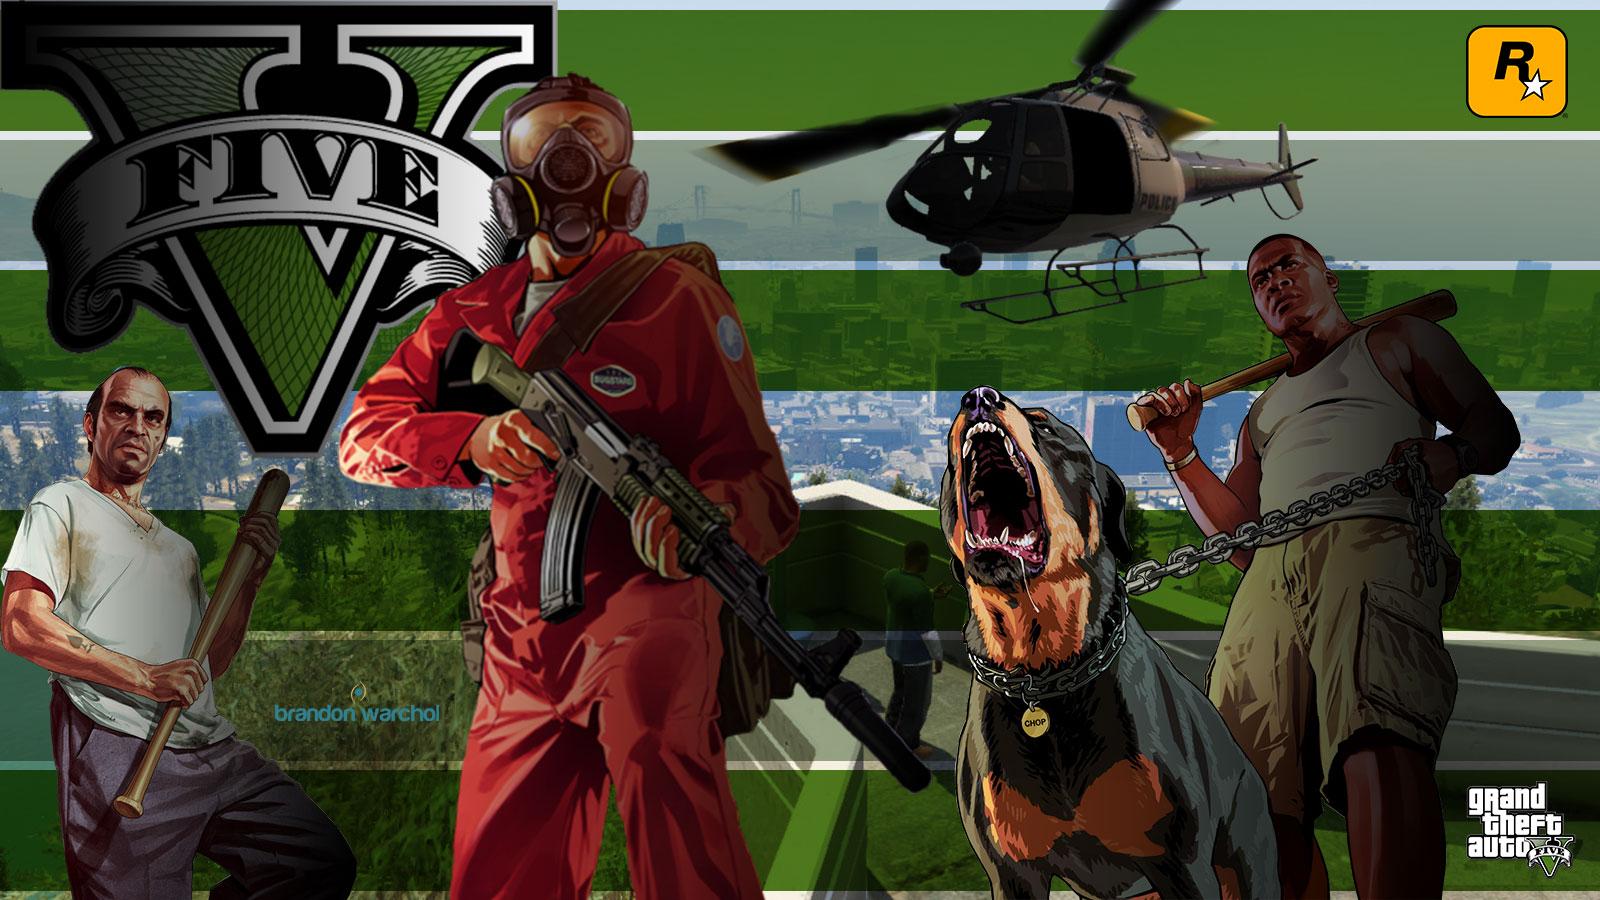 Gta 5 Wallpaper WarSchaff Gaming 1600x900